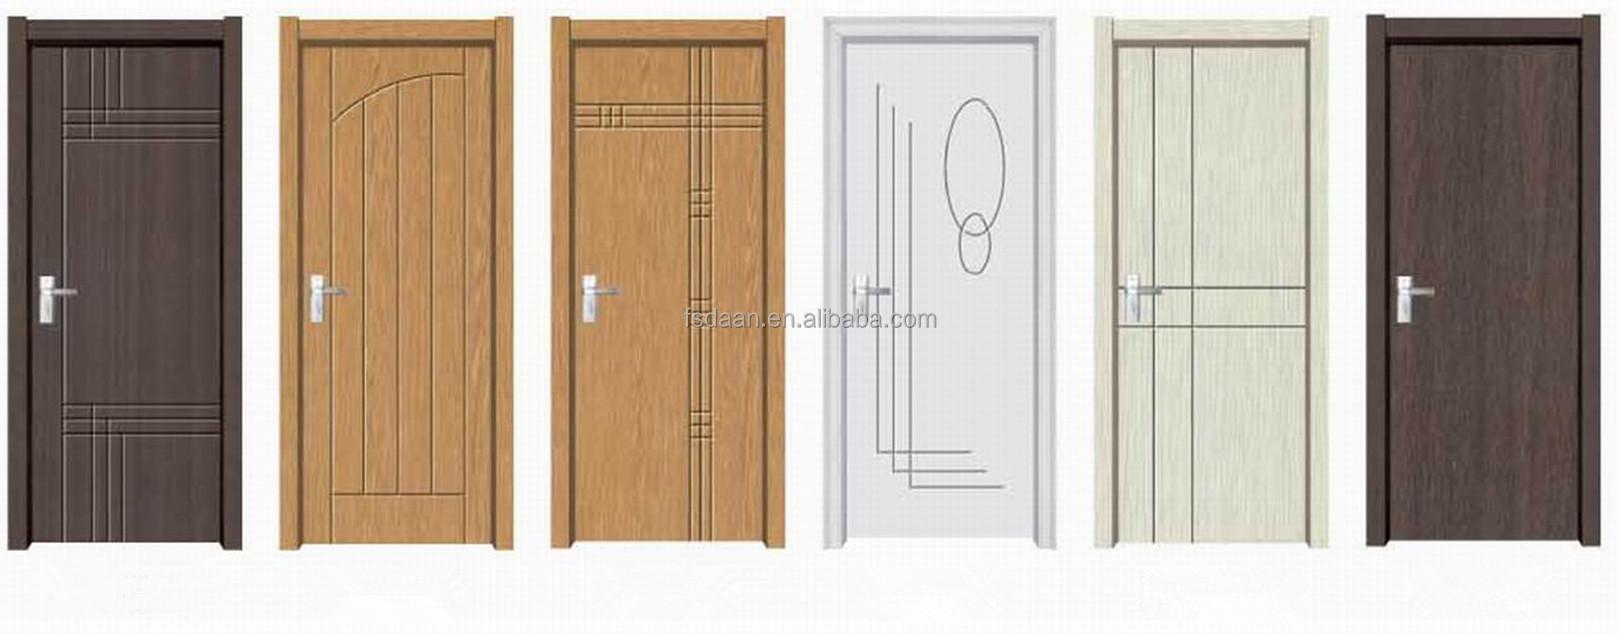 Plastic Door Elegant Plastic Doors For Bathrooms Popular New Style Models Of Pertaining To Pvc